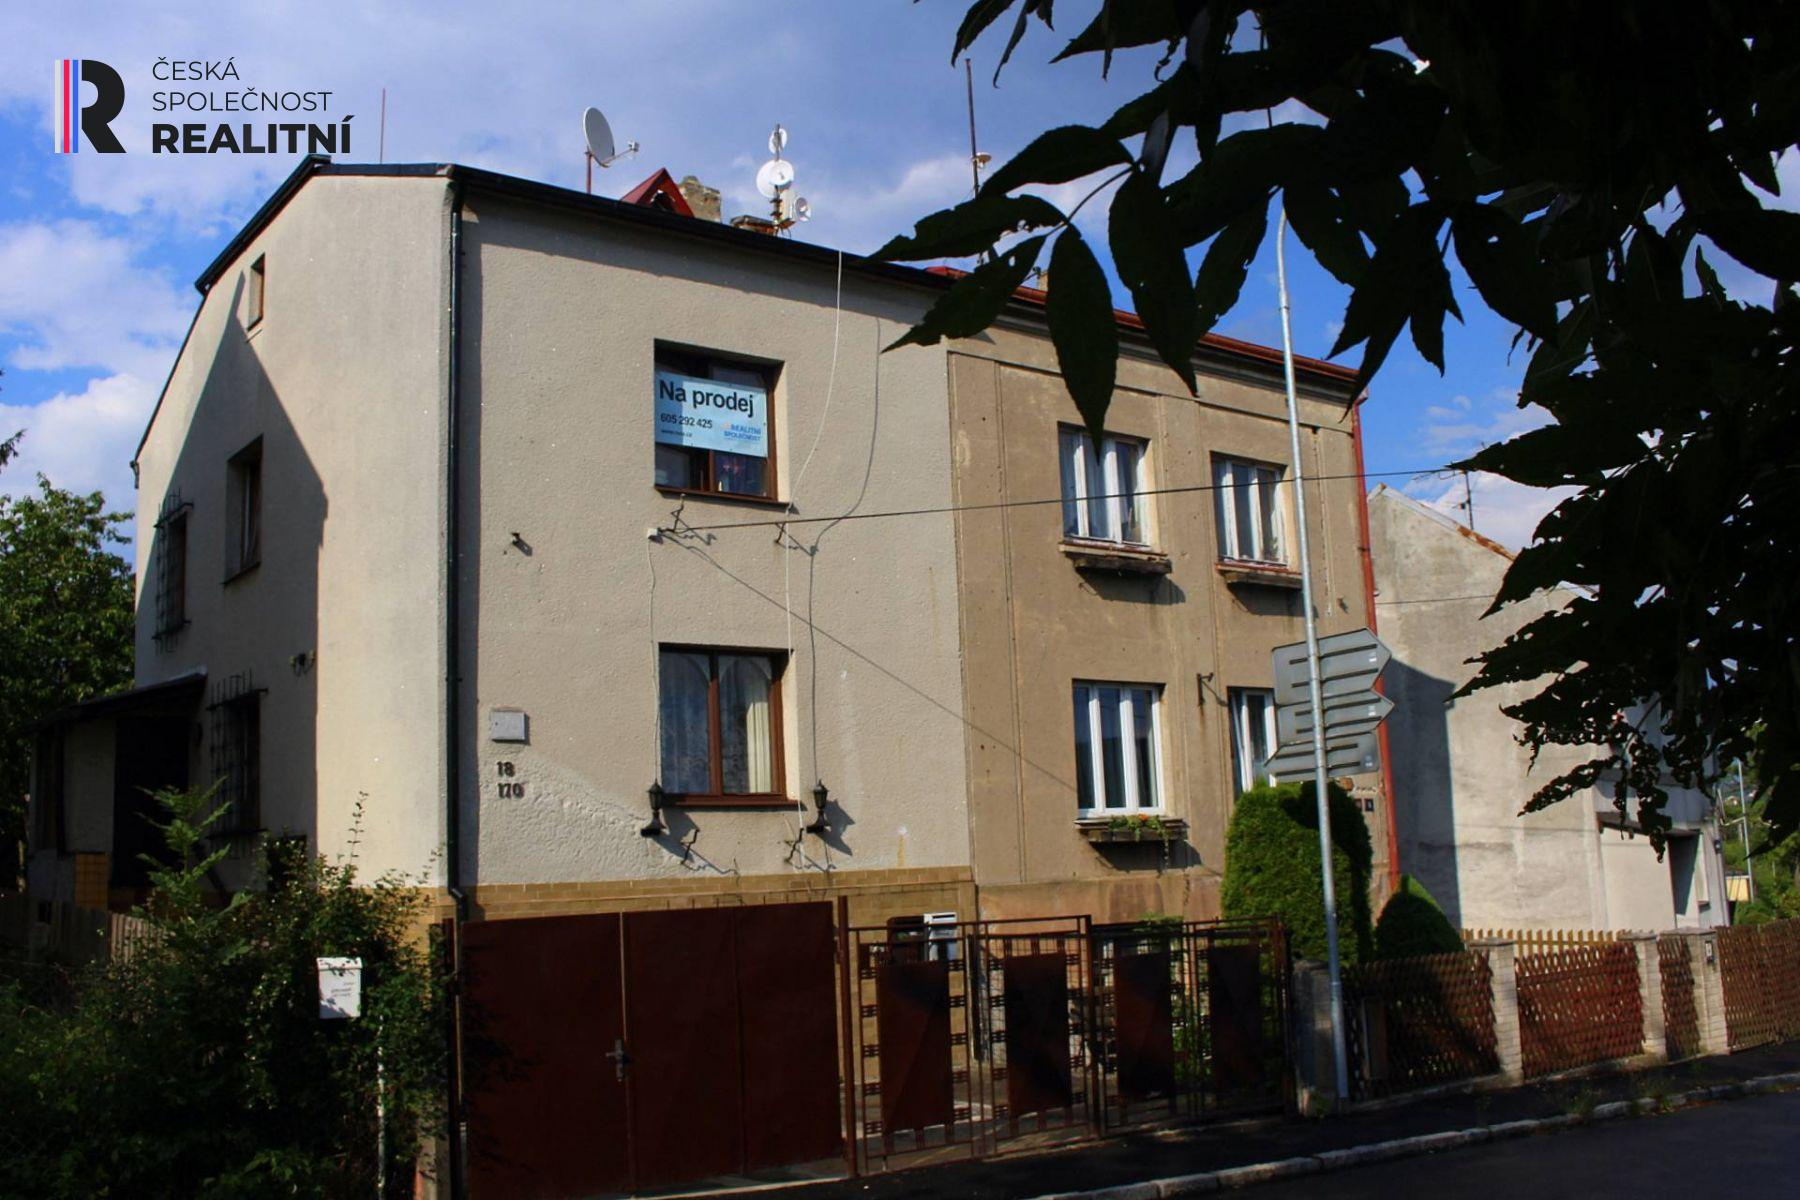 Prodej, Dům RD v bloku, 130m2, Dvory, Karlovy Vary